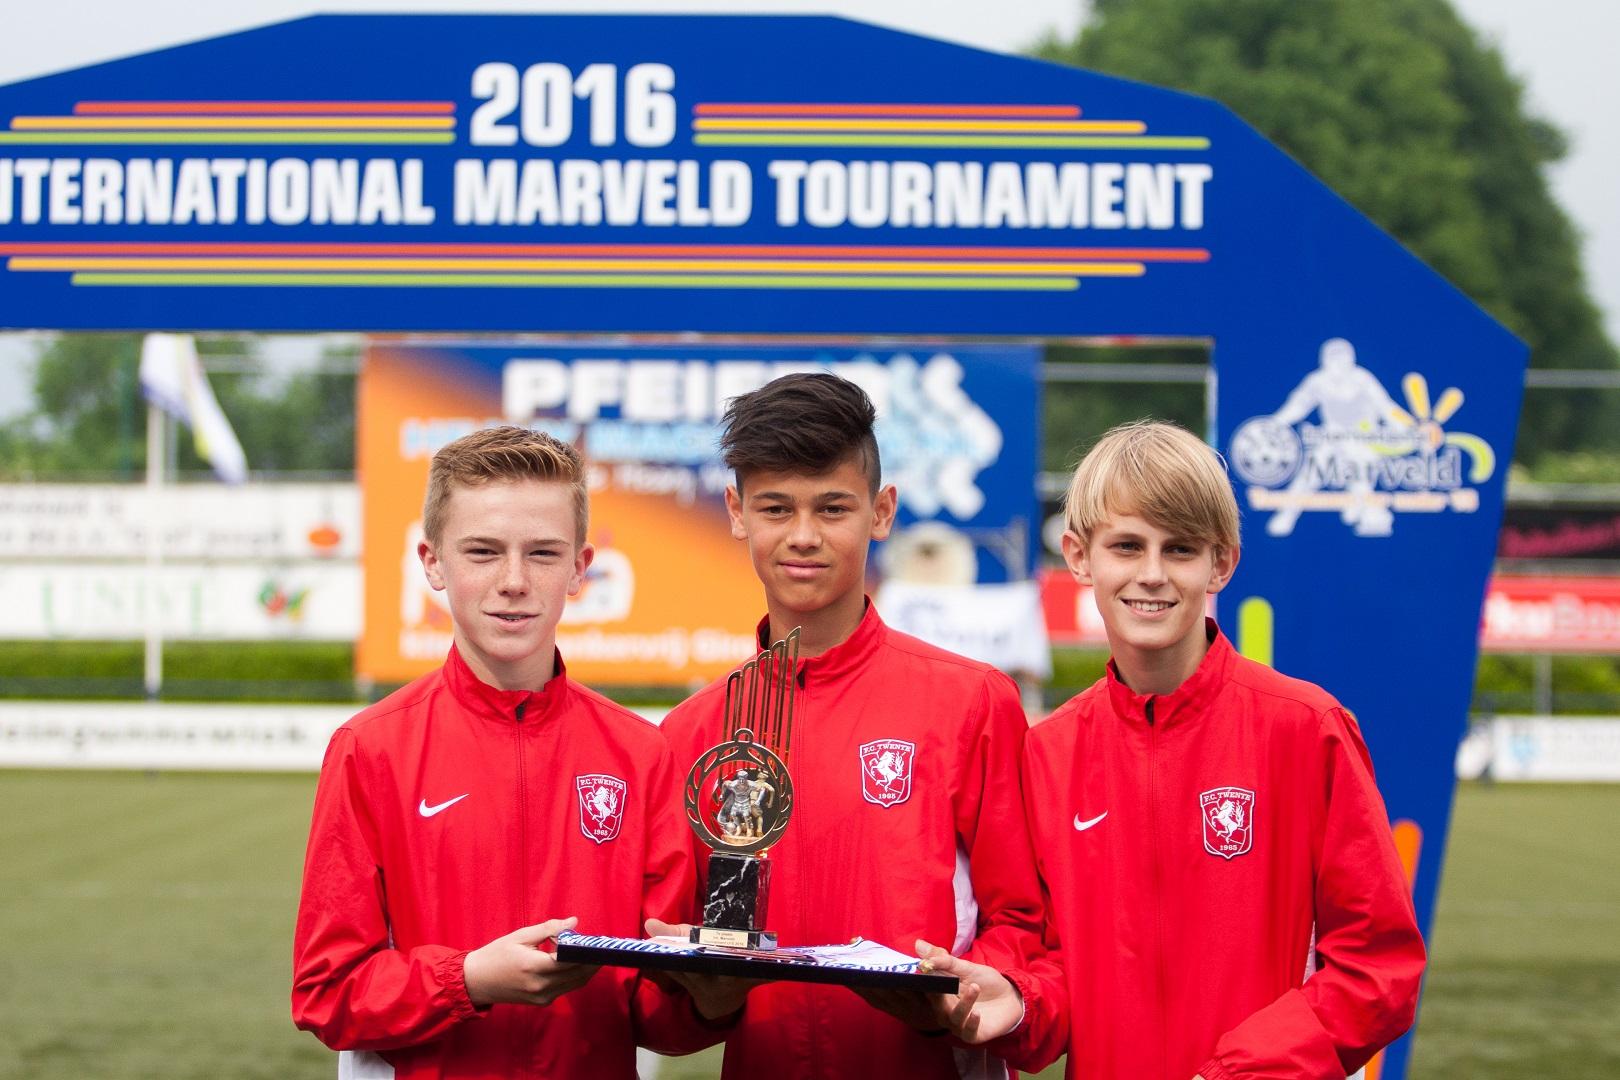 Marveld Tournament 2016 - Daan Rots En Juul Stokkers Van FC Twente